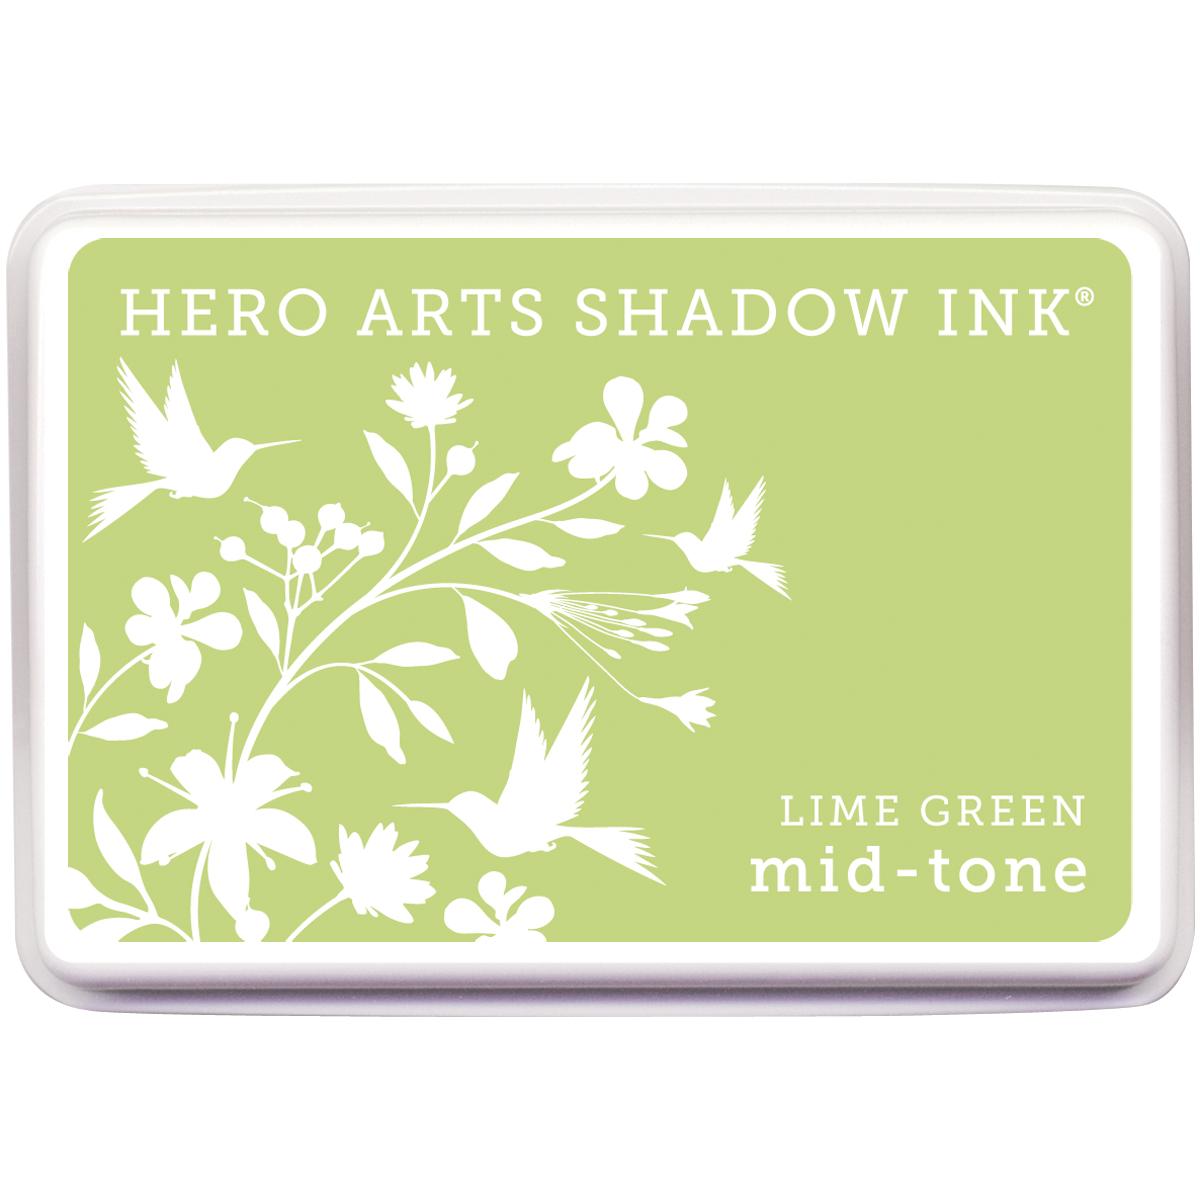 Hero Arts Midtone Shadow Ink Pad-Lime Green